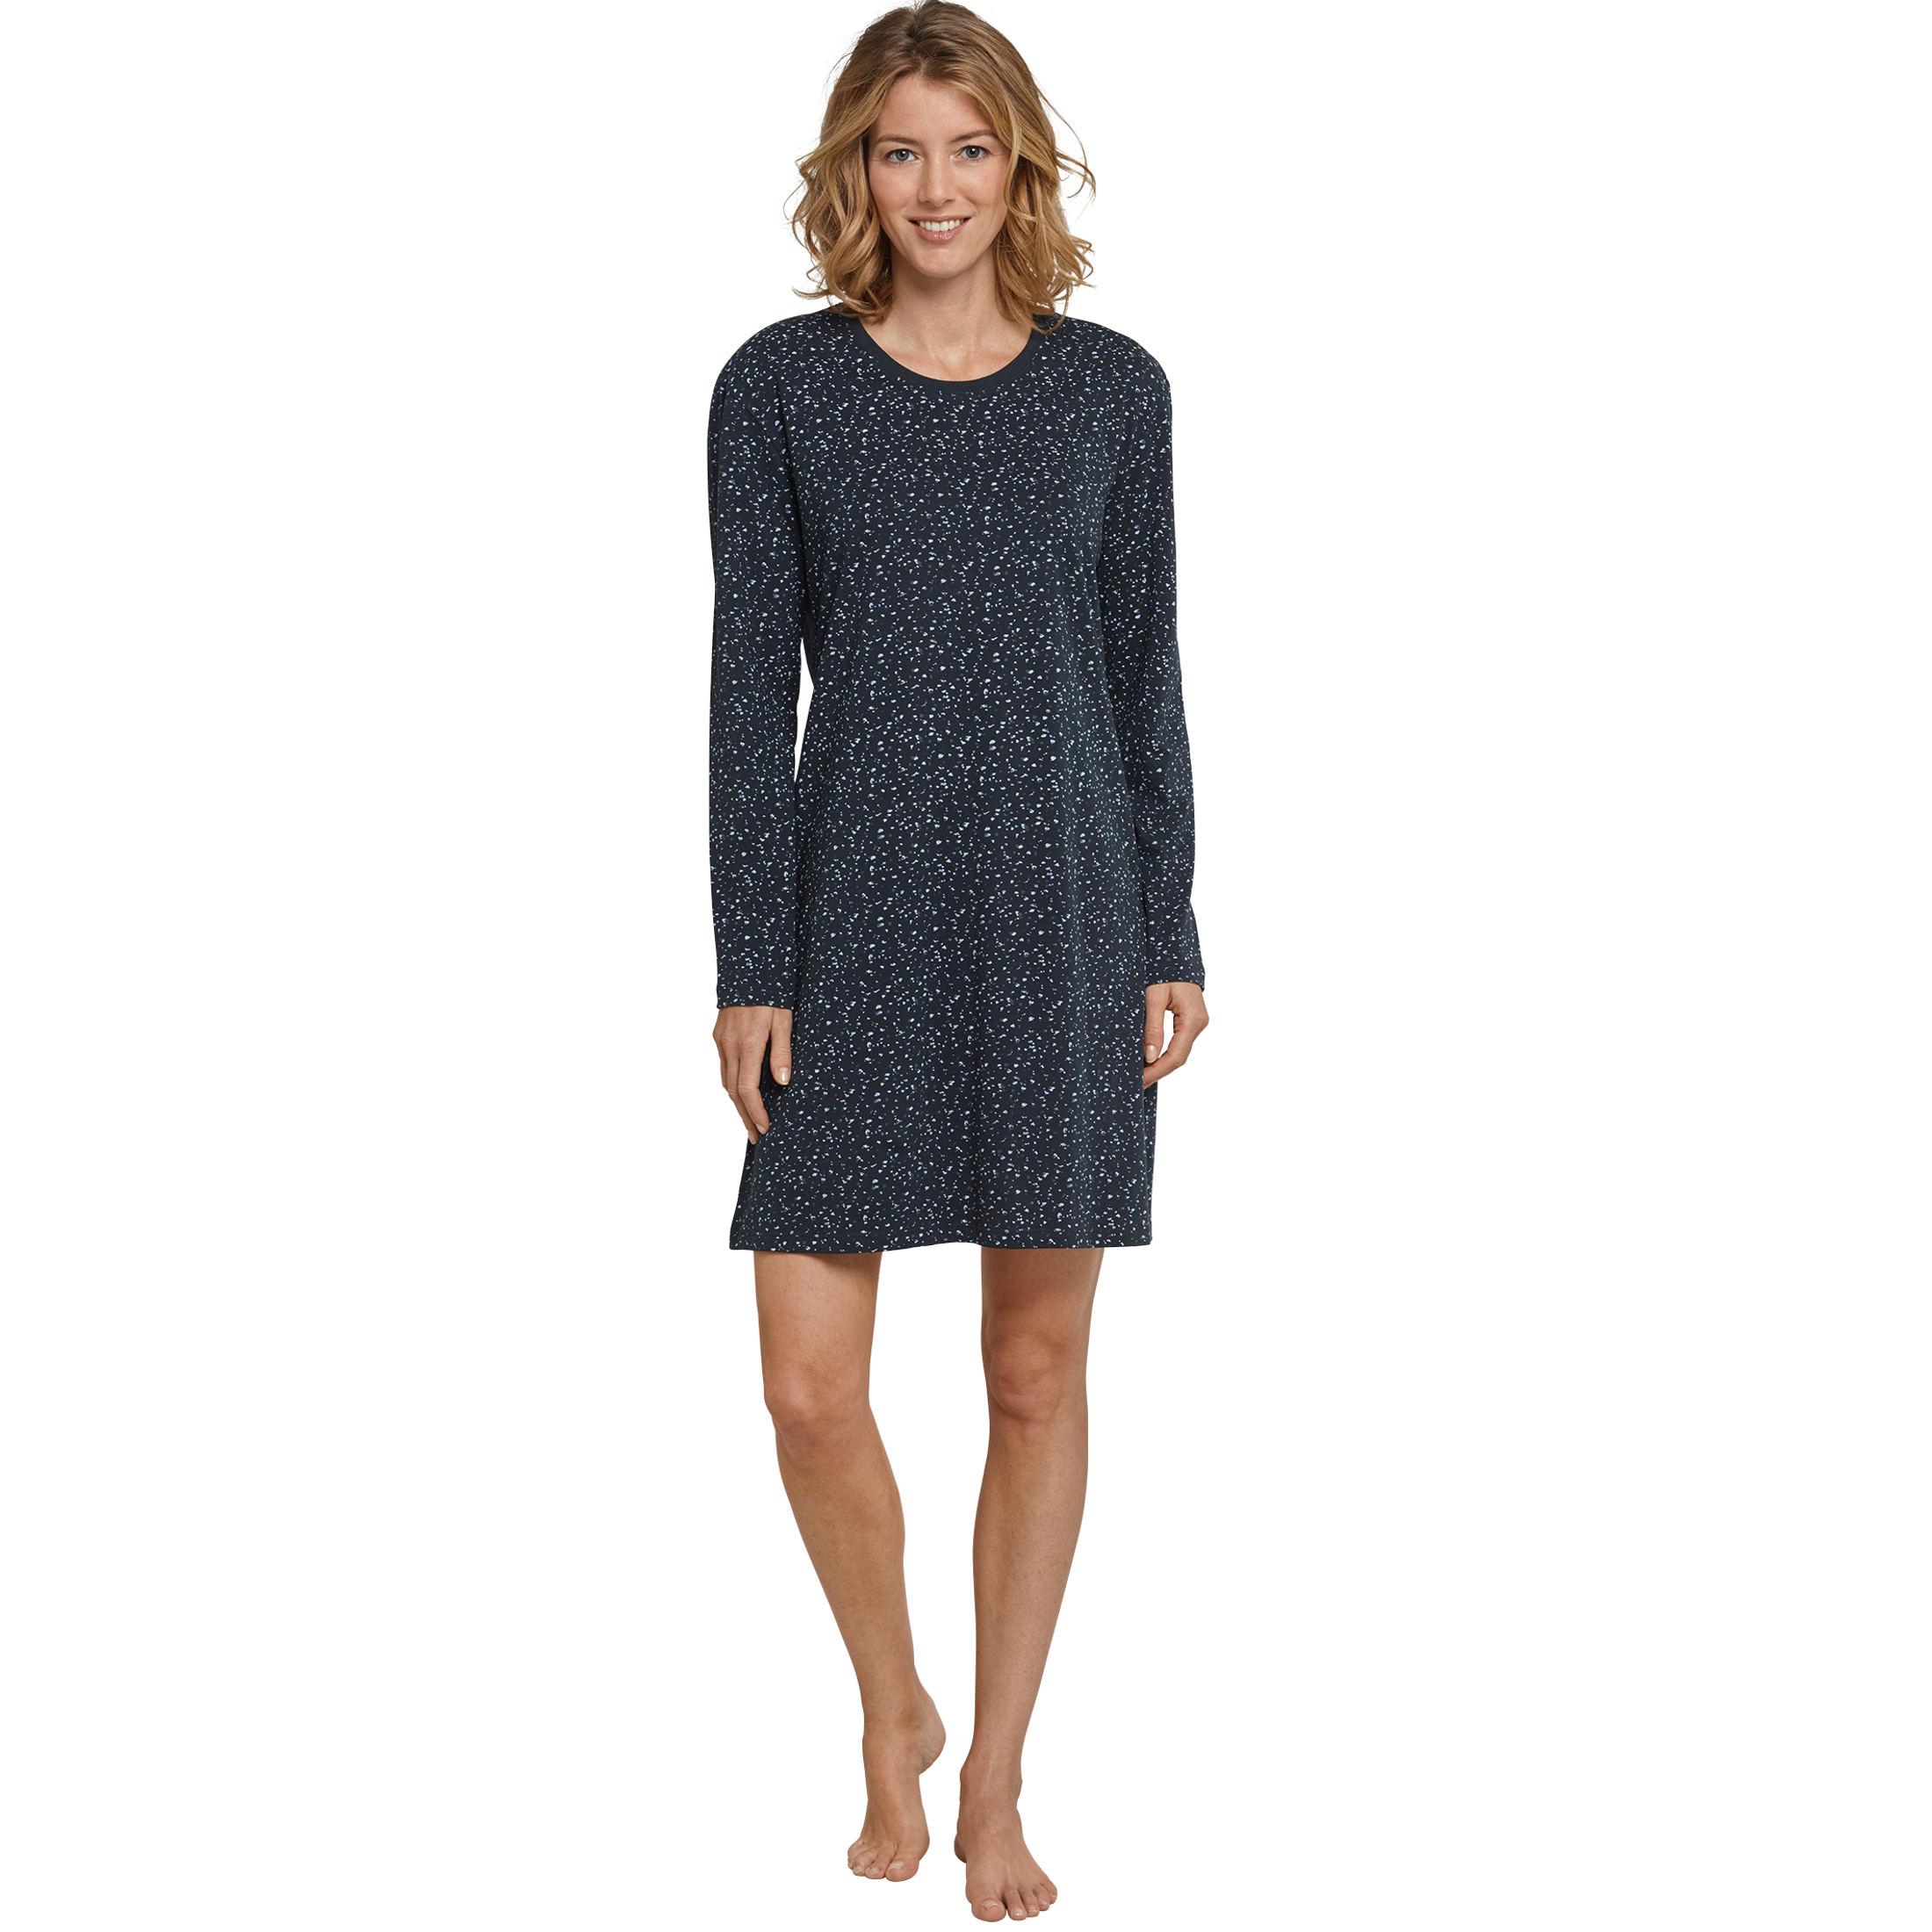 SCHIESSER Damen Nachthemd langarm 90 cm Jersey Dots graphit Go Indigo 8a127a8ff3